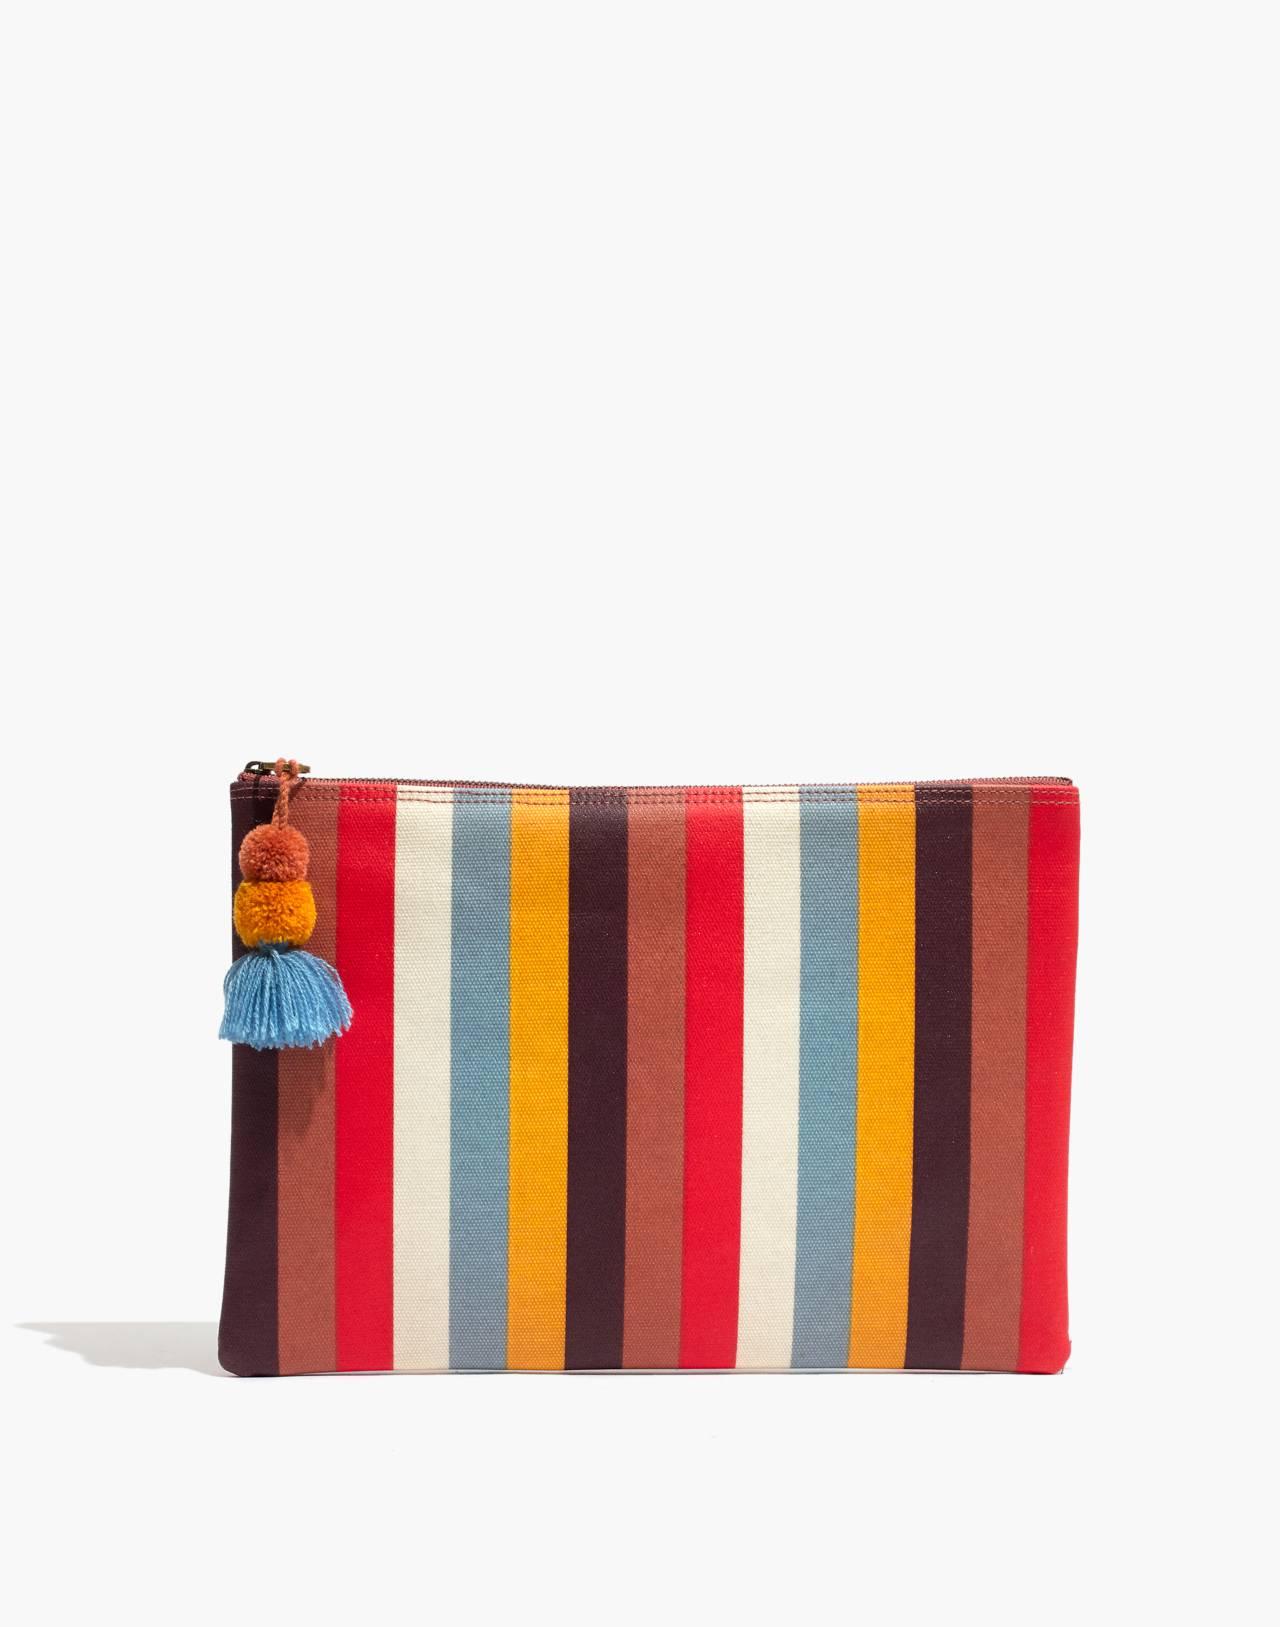 Large Pom-Pom Zip Pouch in Carousel Stripe in sweet dahlia multi image 1